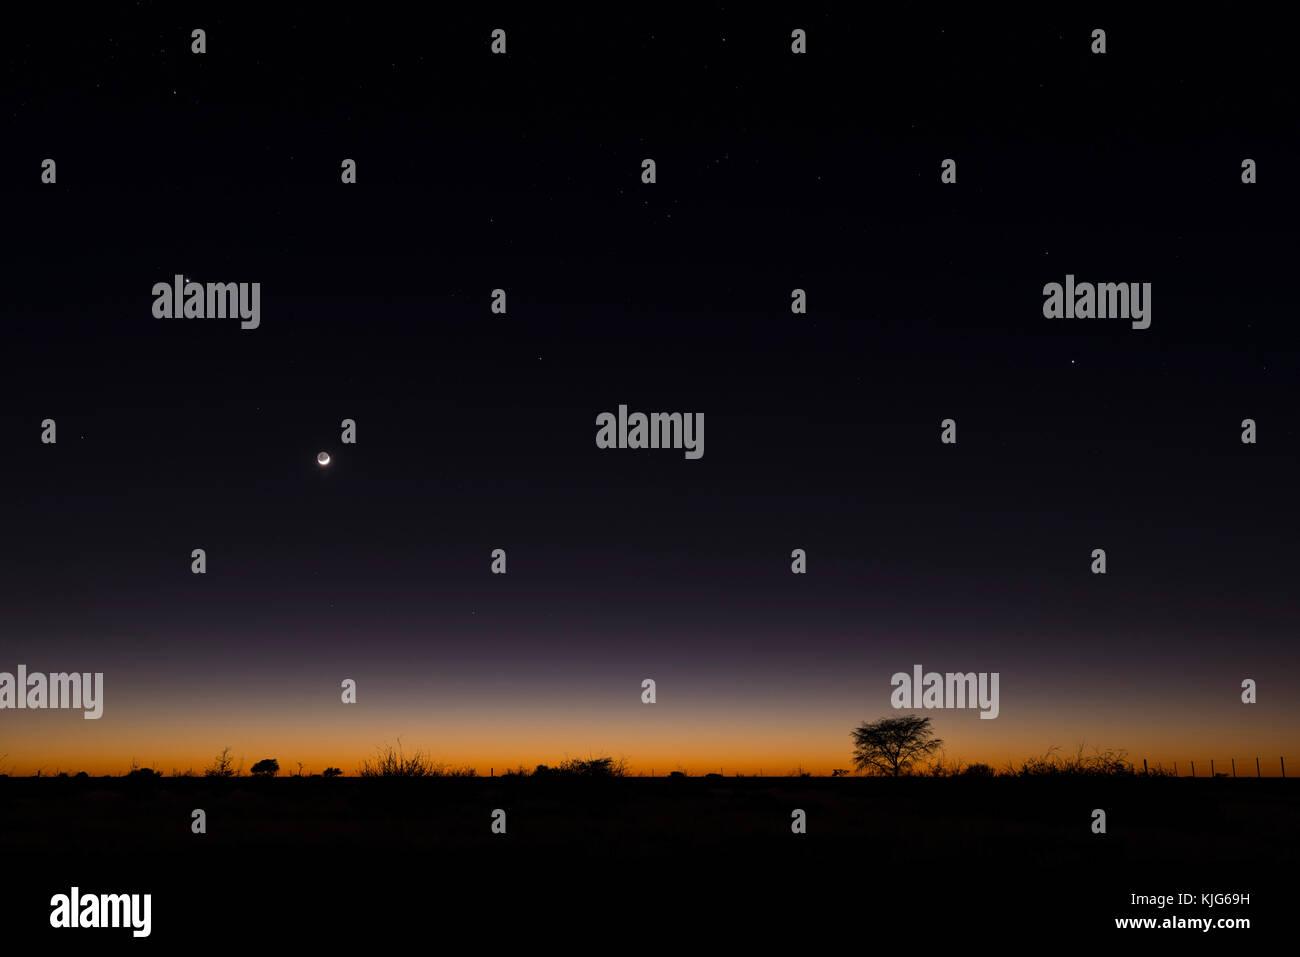 Namibia, Region Khomas, near Uhlenhorst, Astrophoto, RIsing moon and Planet Venus above a glowing savannah horizon - Stock Image